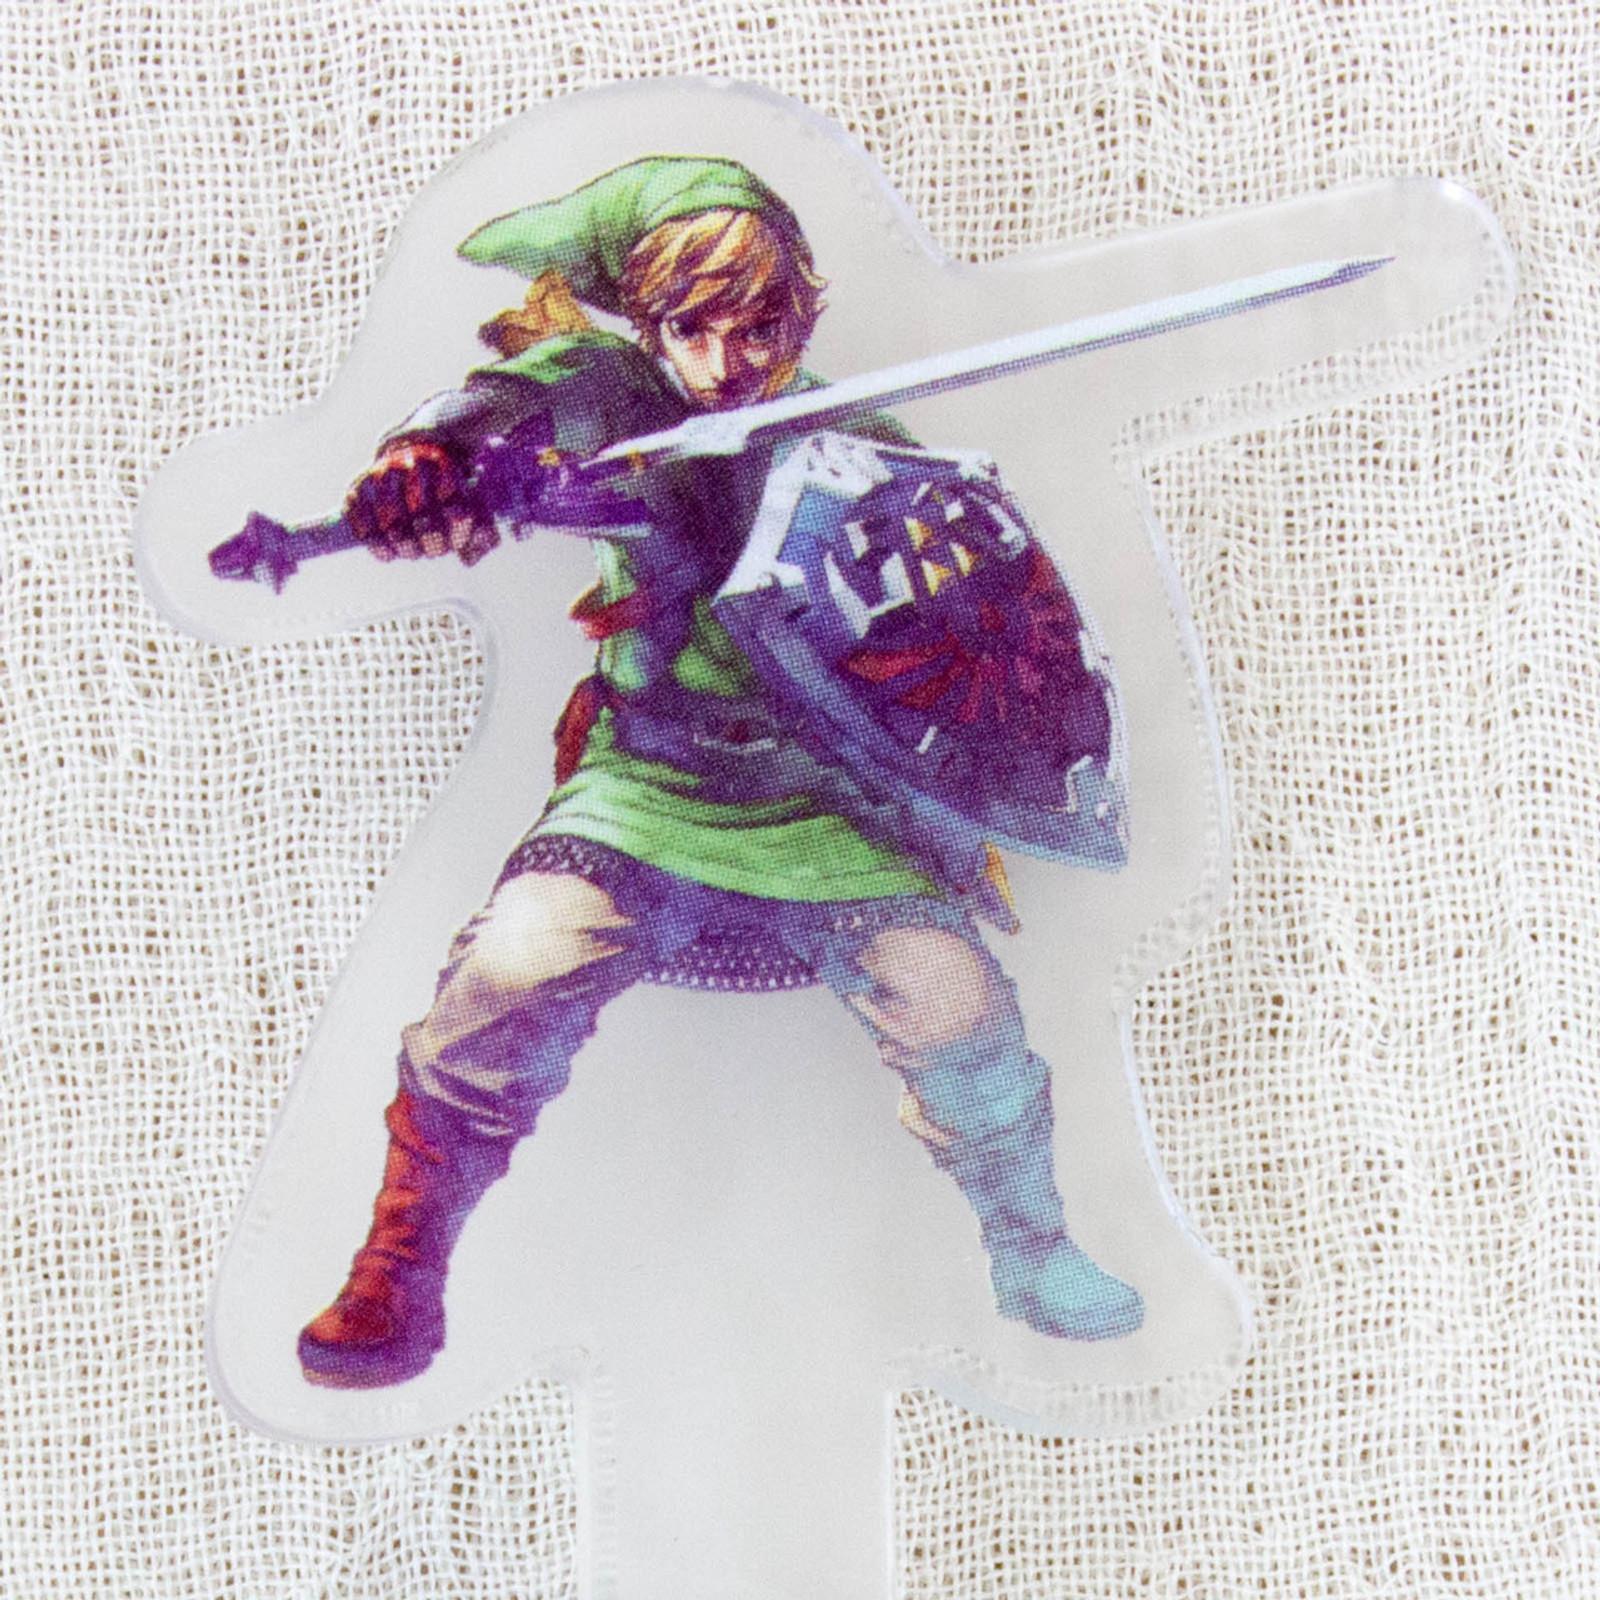 Legend of Zelda Historical 3DS Chara Touch Pen JAPAN FAMICOM NES NINTENDO 5